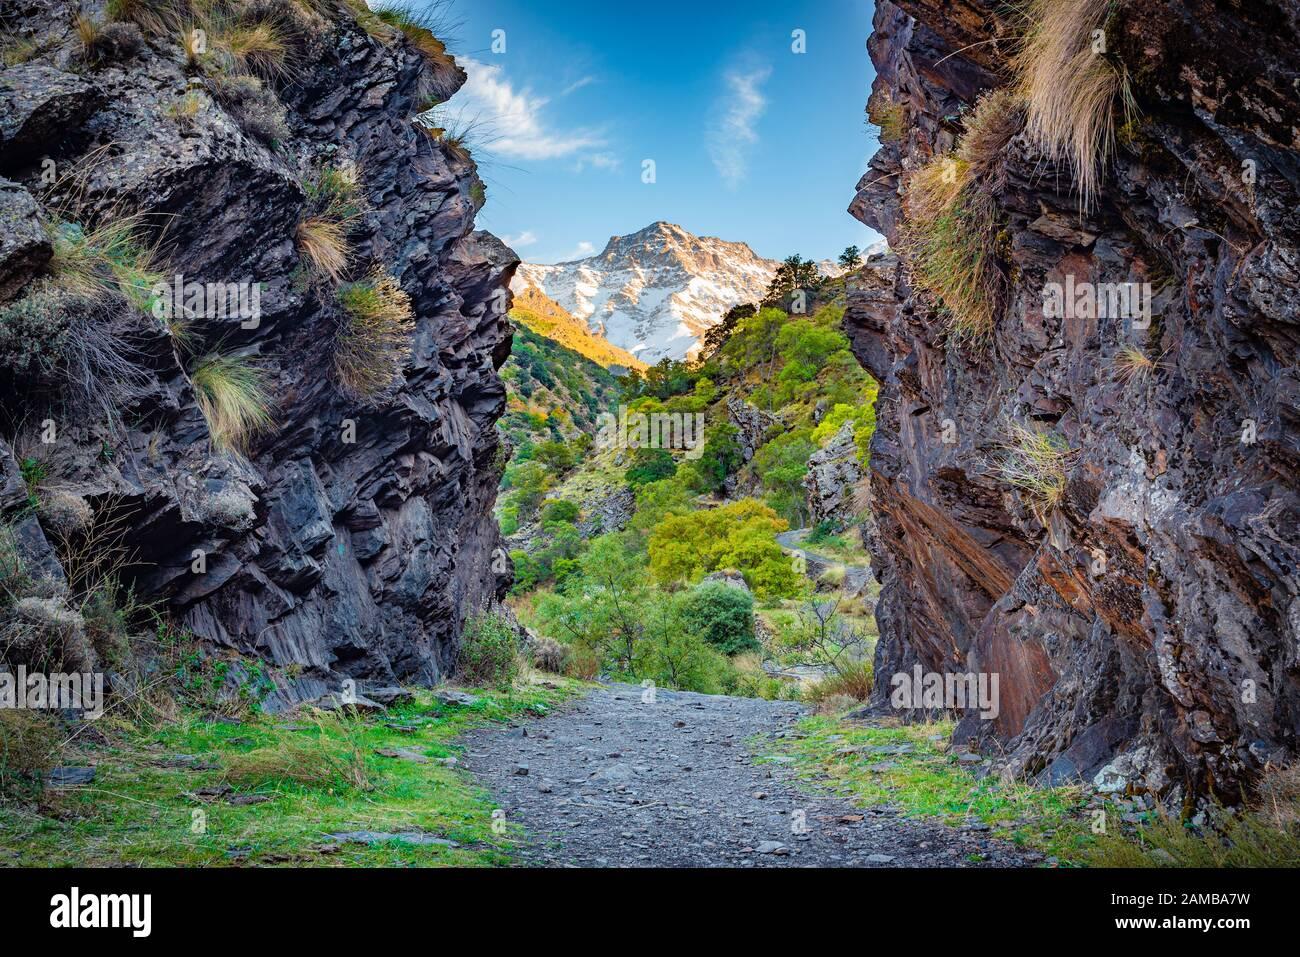 gjar-sierra-spain-october-27-2019-beautiful-view-from-the-hiking-trail-vereda-de-la-estrella-in-the-natural-park-of-sierra-nevada-2AMBA7W.jpg